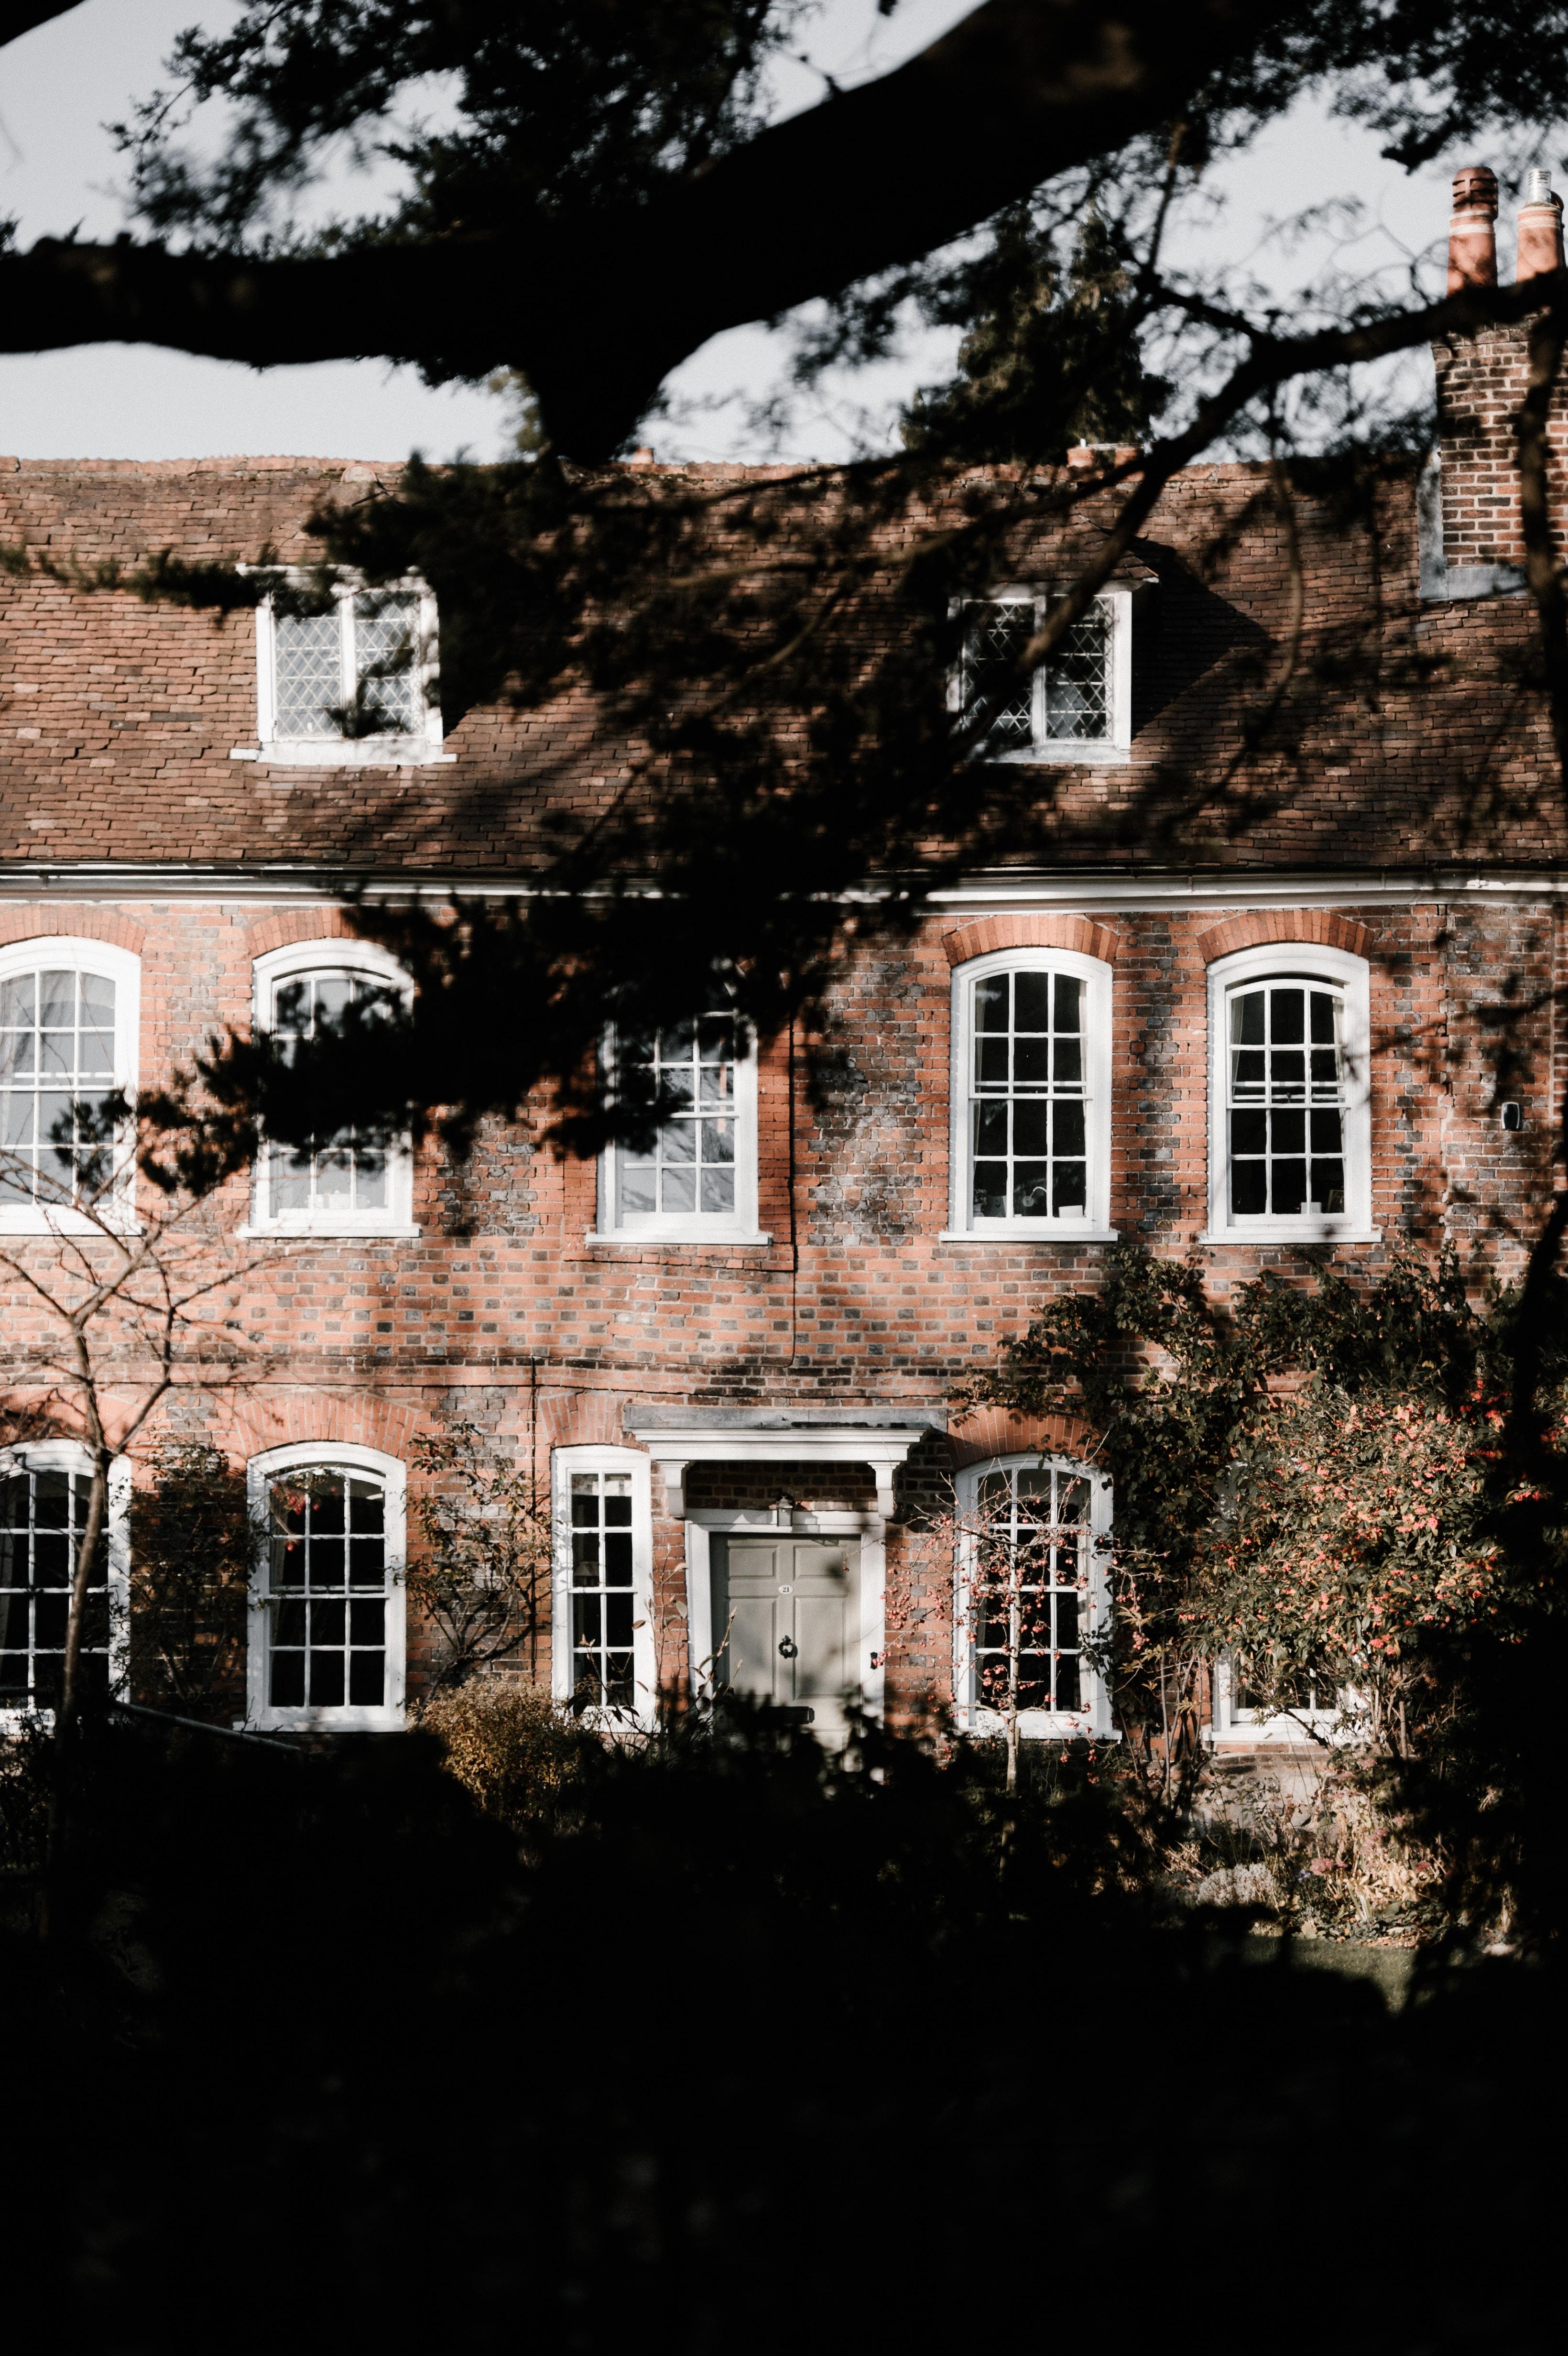 brown brick building near trees